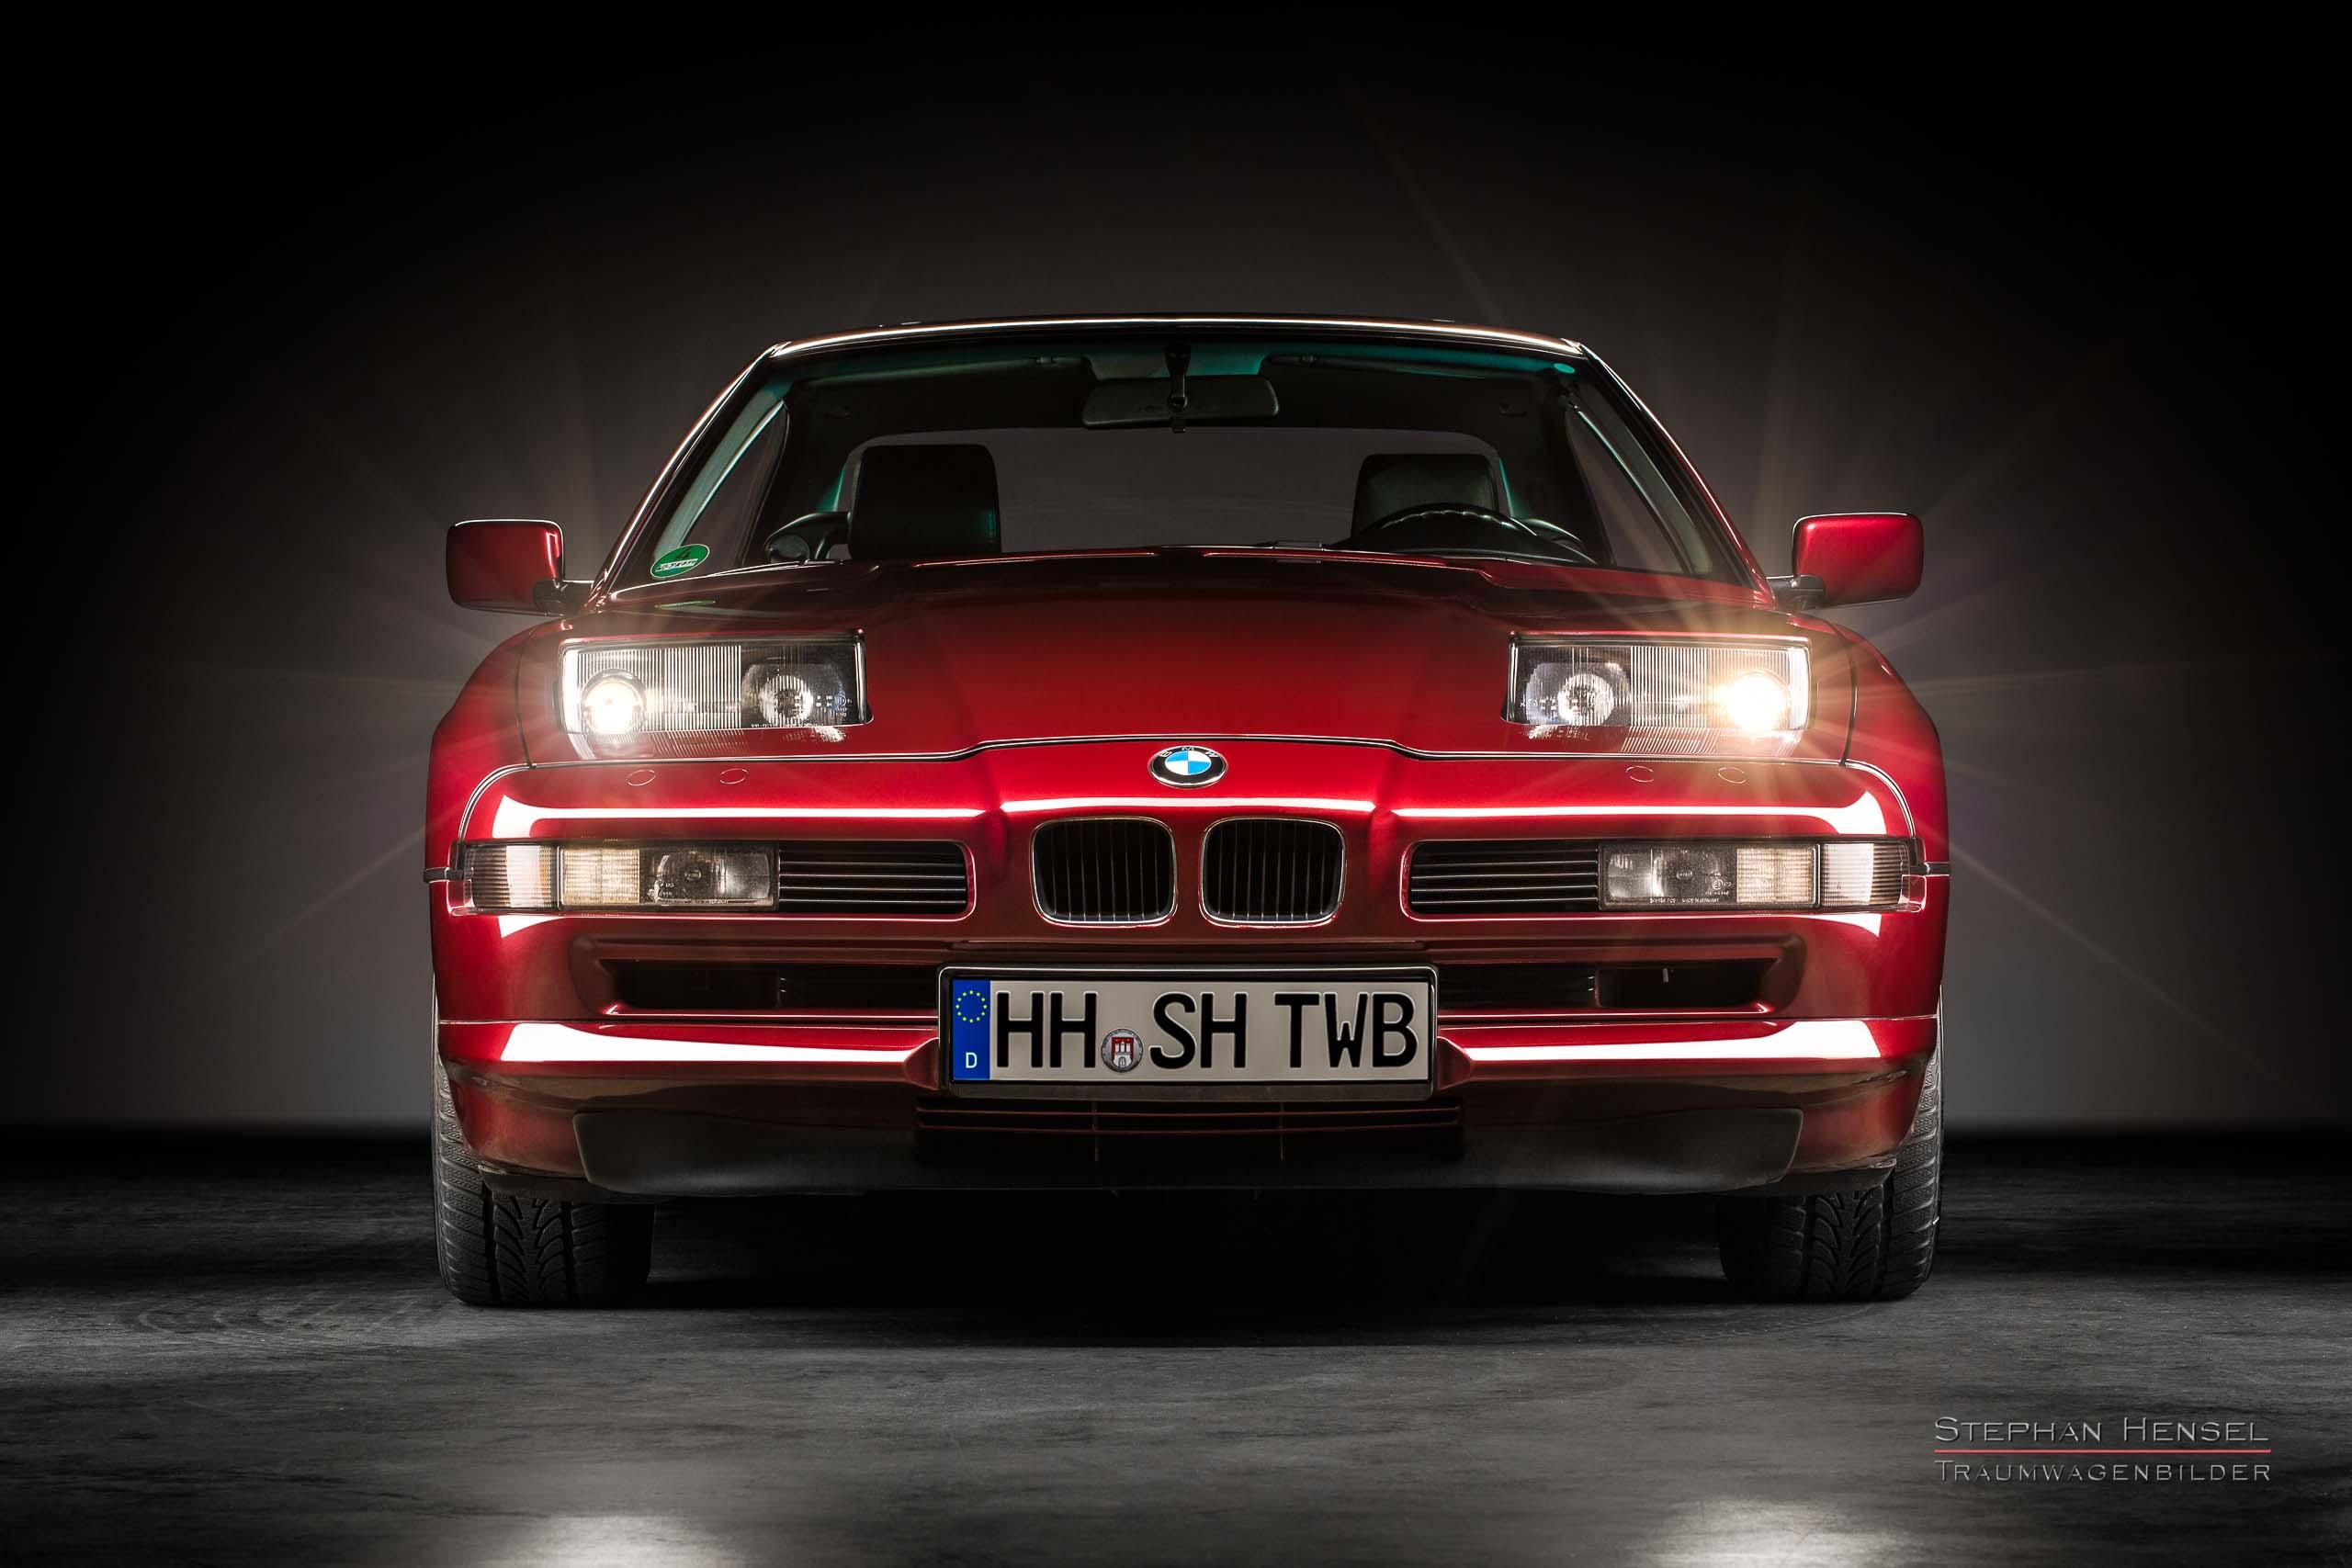 BMW 850i, 1991, Frontalansicht, Autofotograf, Hamburg, Automobilfotograf, Oldtimerfotograf, Oldtimerfotografie, Car Photography, Stephan Hensel